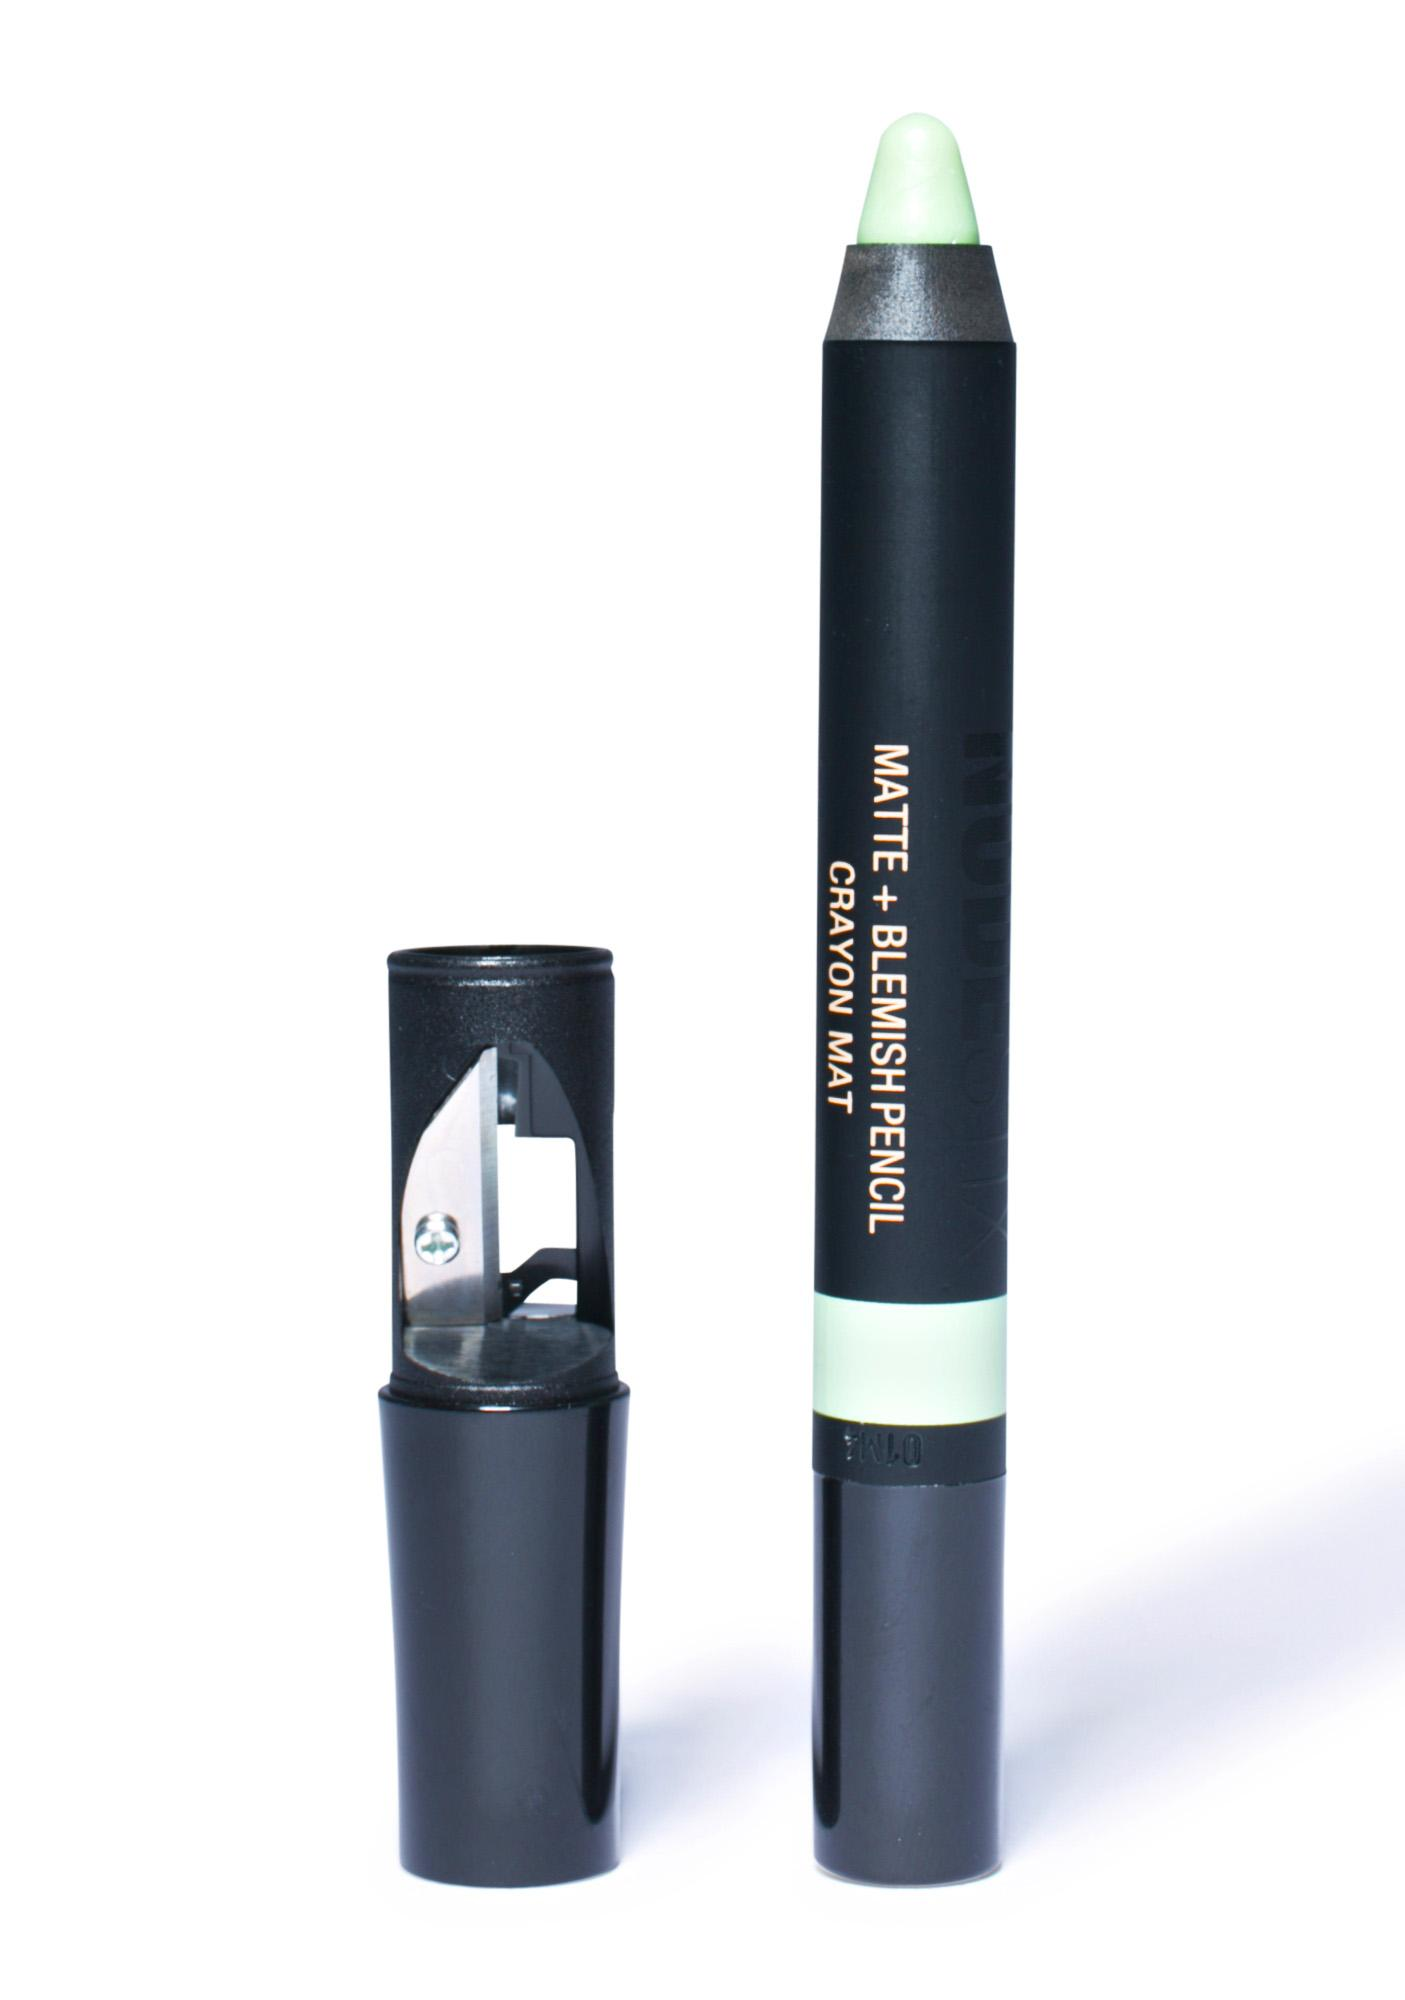 Nudestix Matte Skin + Blemish Pencil